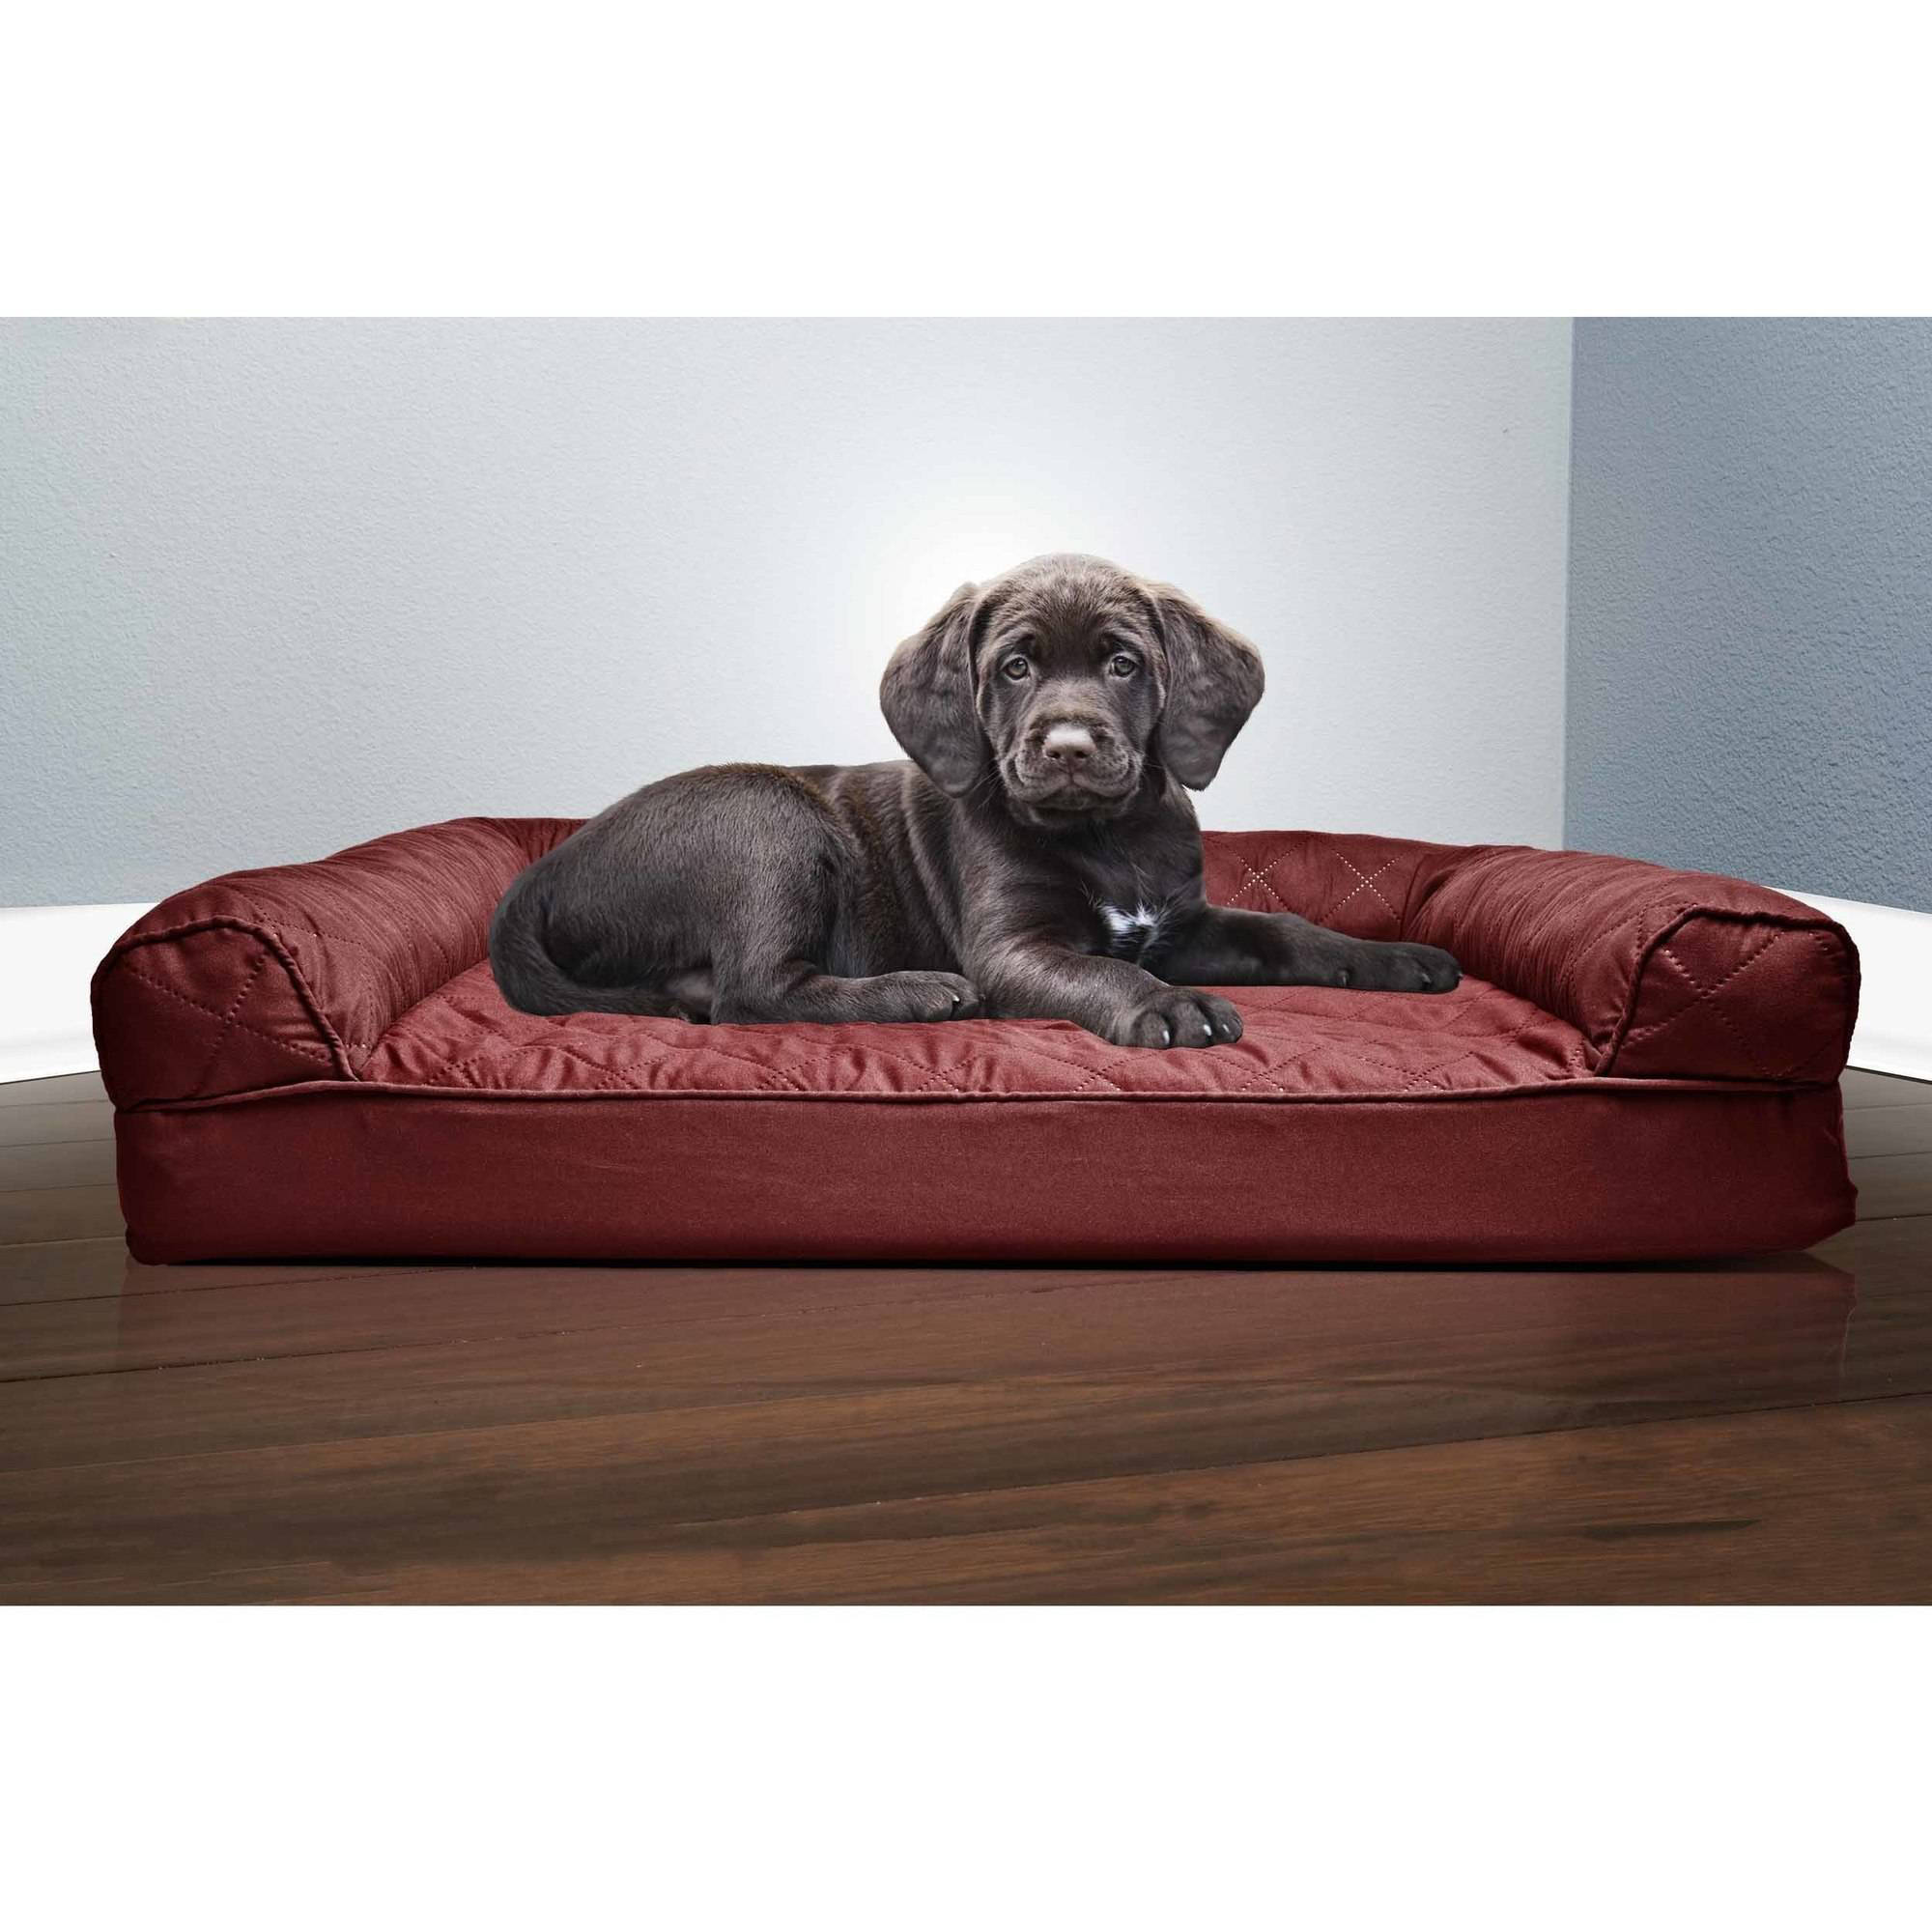 FurHaven Quilted Sofa Dog Bed Pet Bed Walmartcom